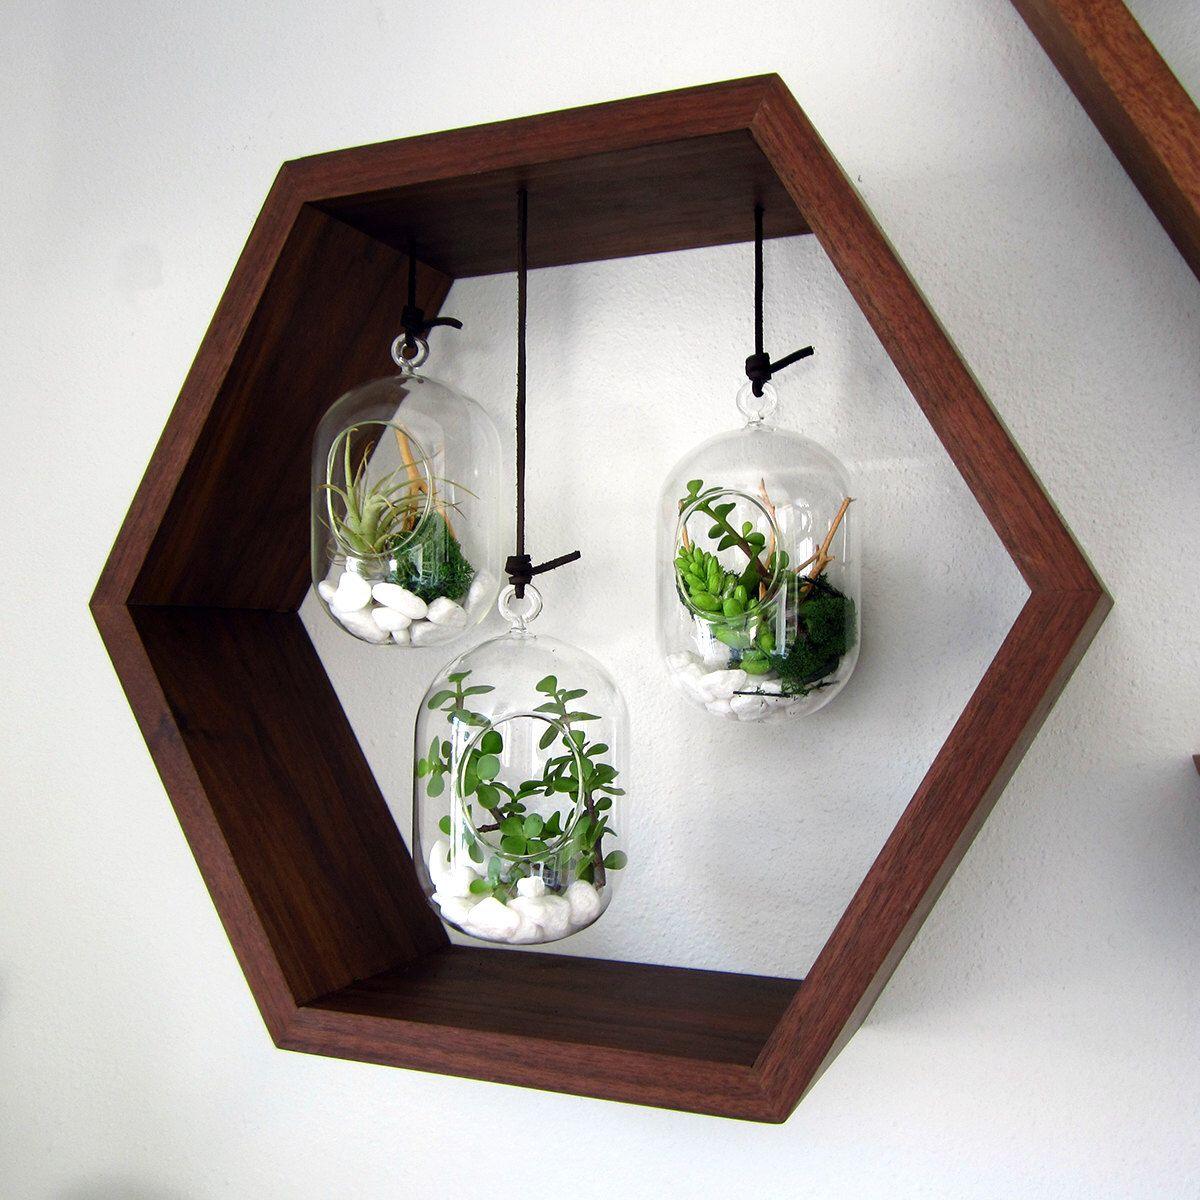 Hexagon hanging terrarium garden black walnut wall mounted by